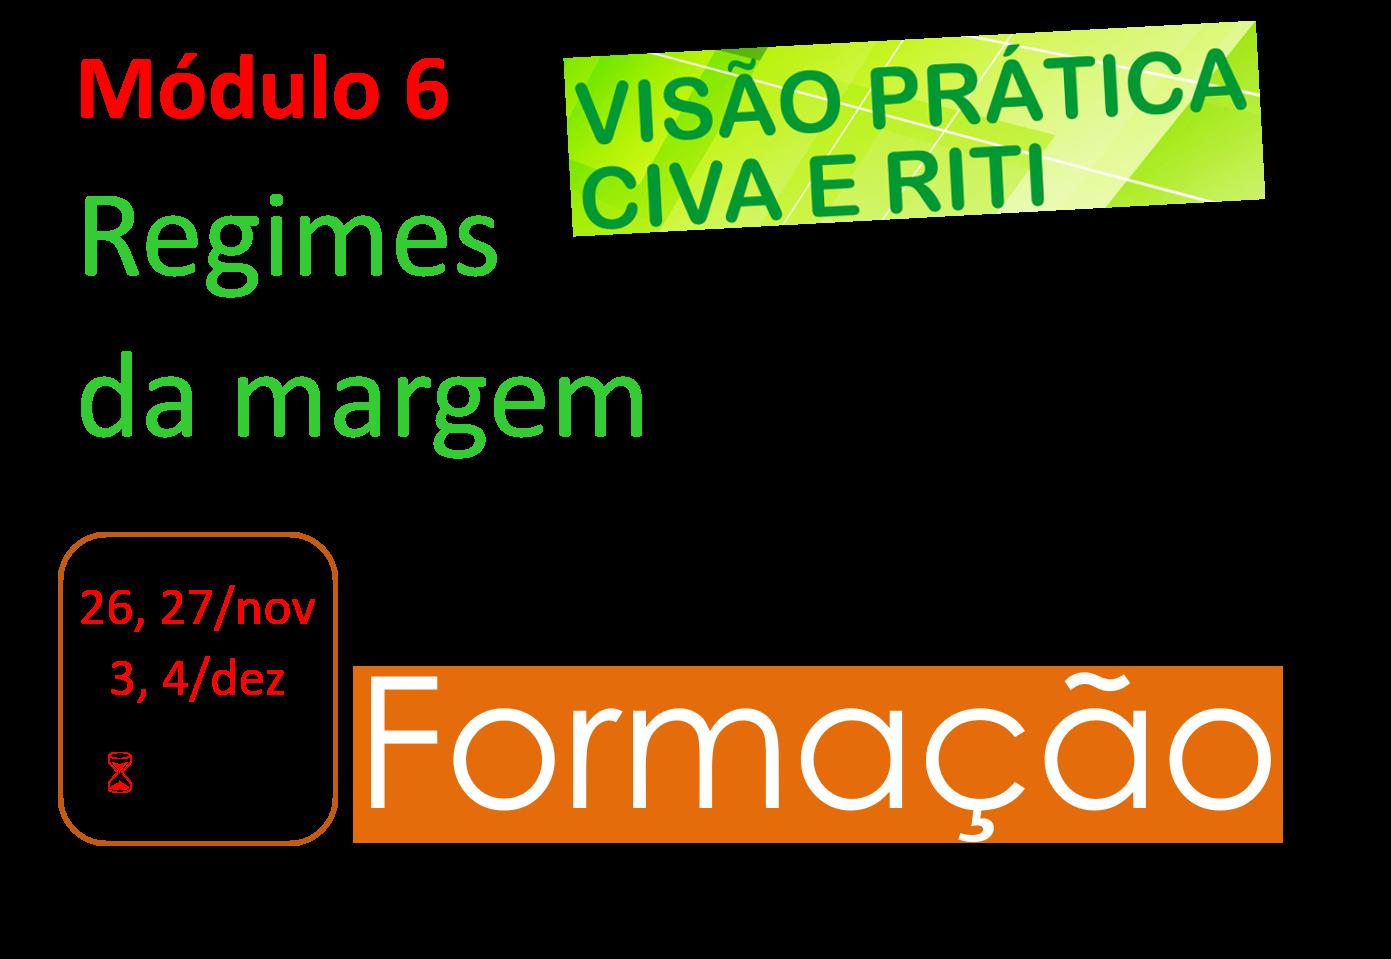 CIVA & RITI    Módulo 6 – Regimes da margem